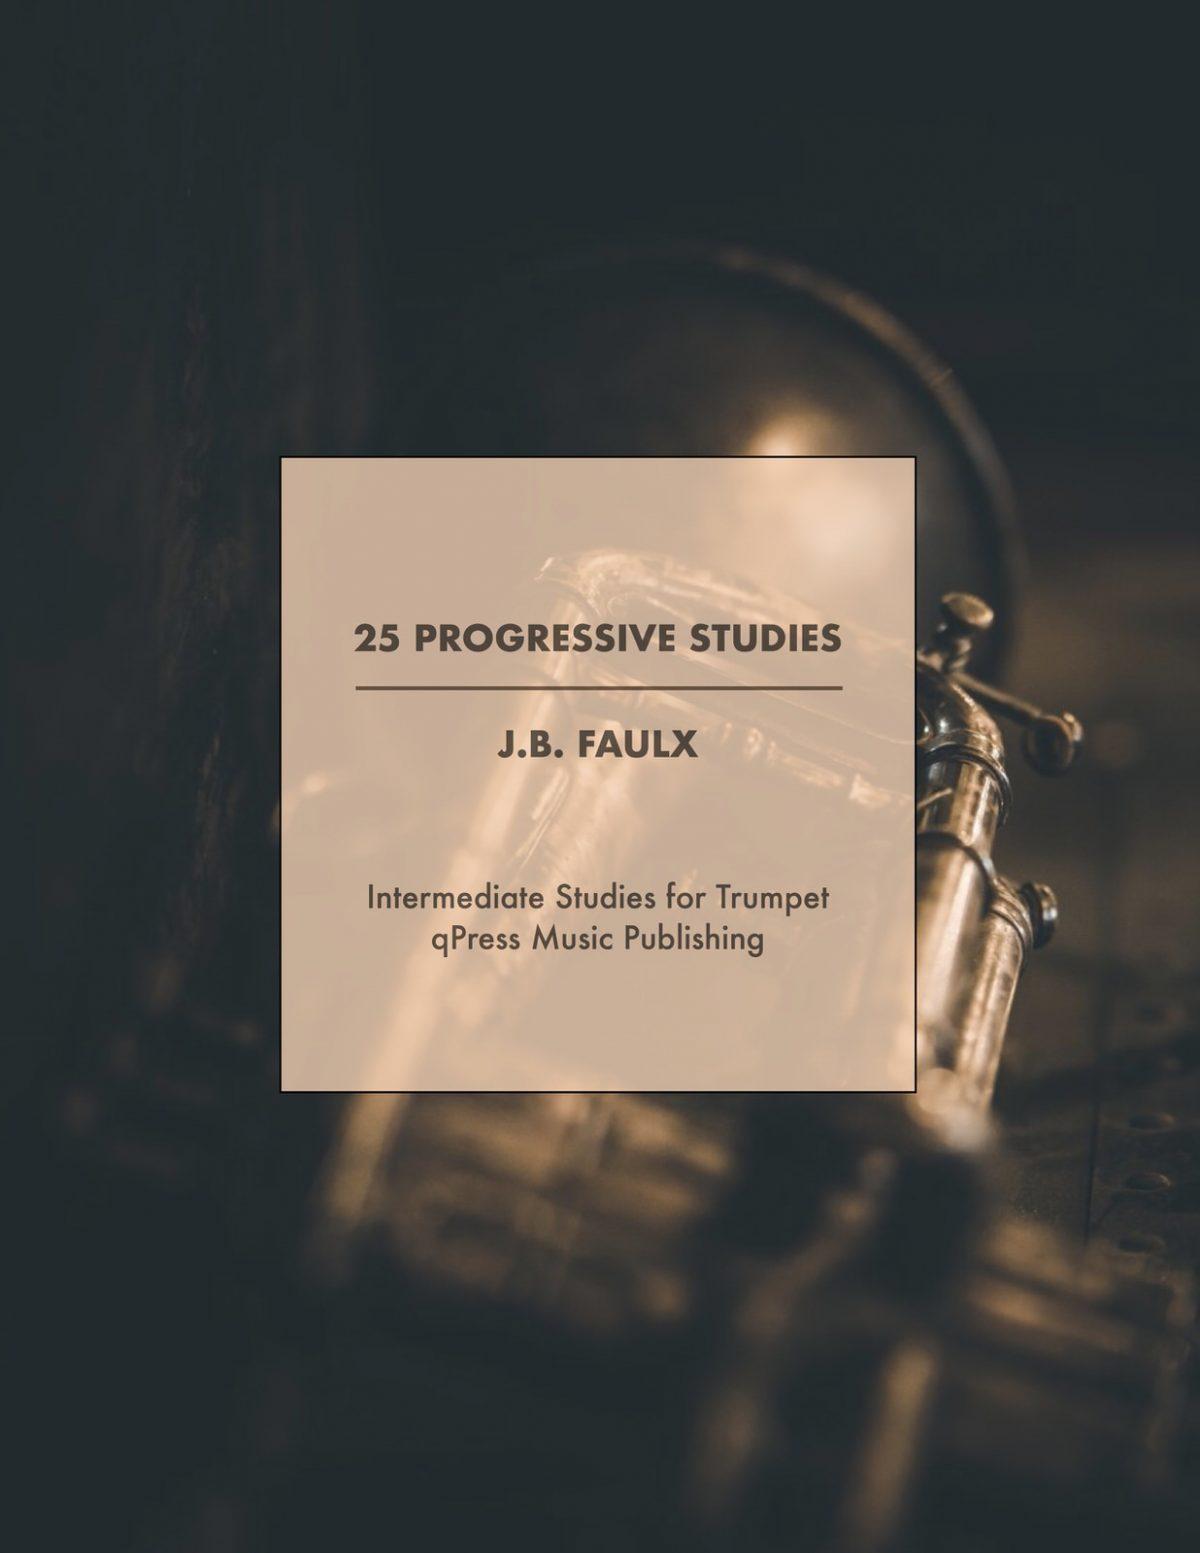 Faulx, JB, 25 Progressive Studies of Medium Difficulty-p01